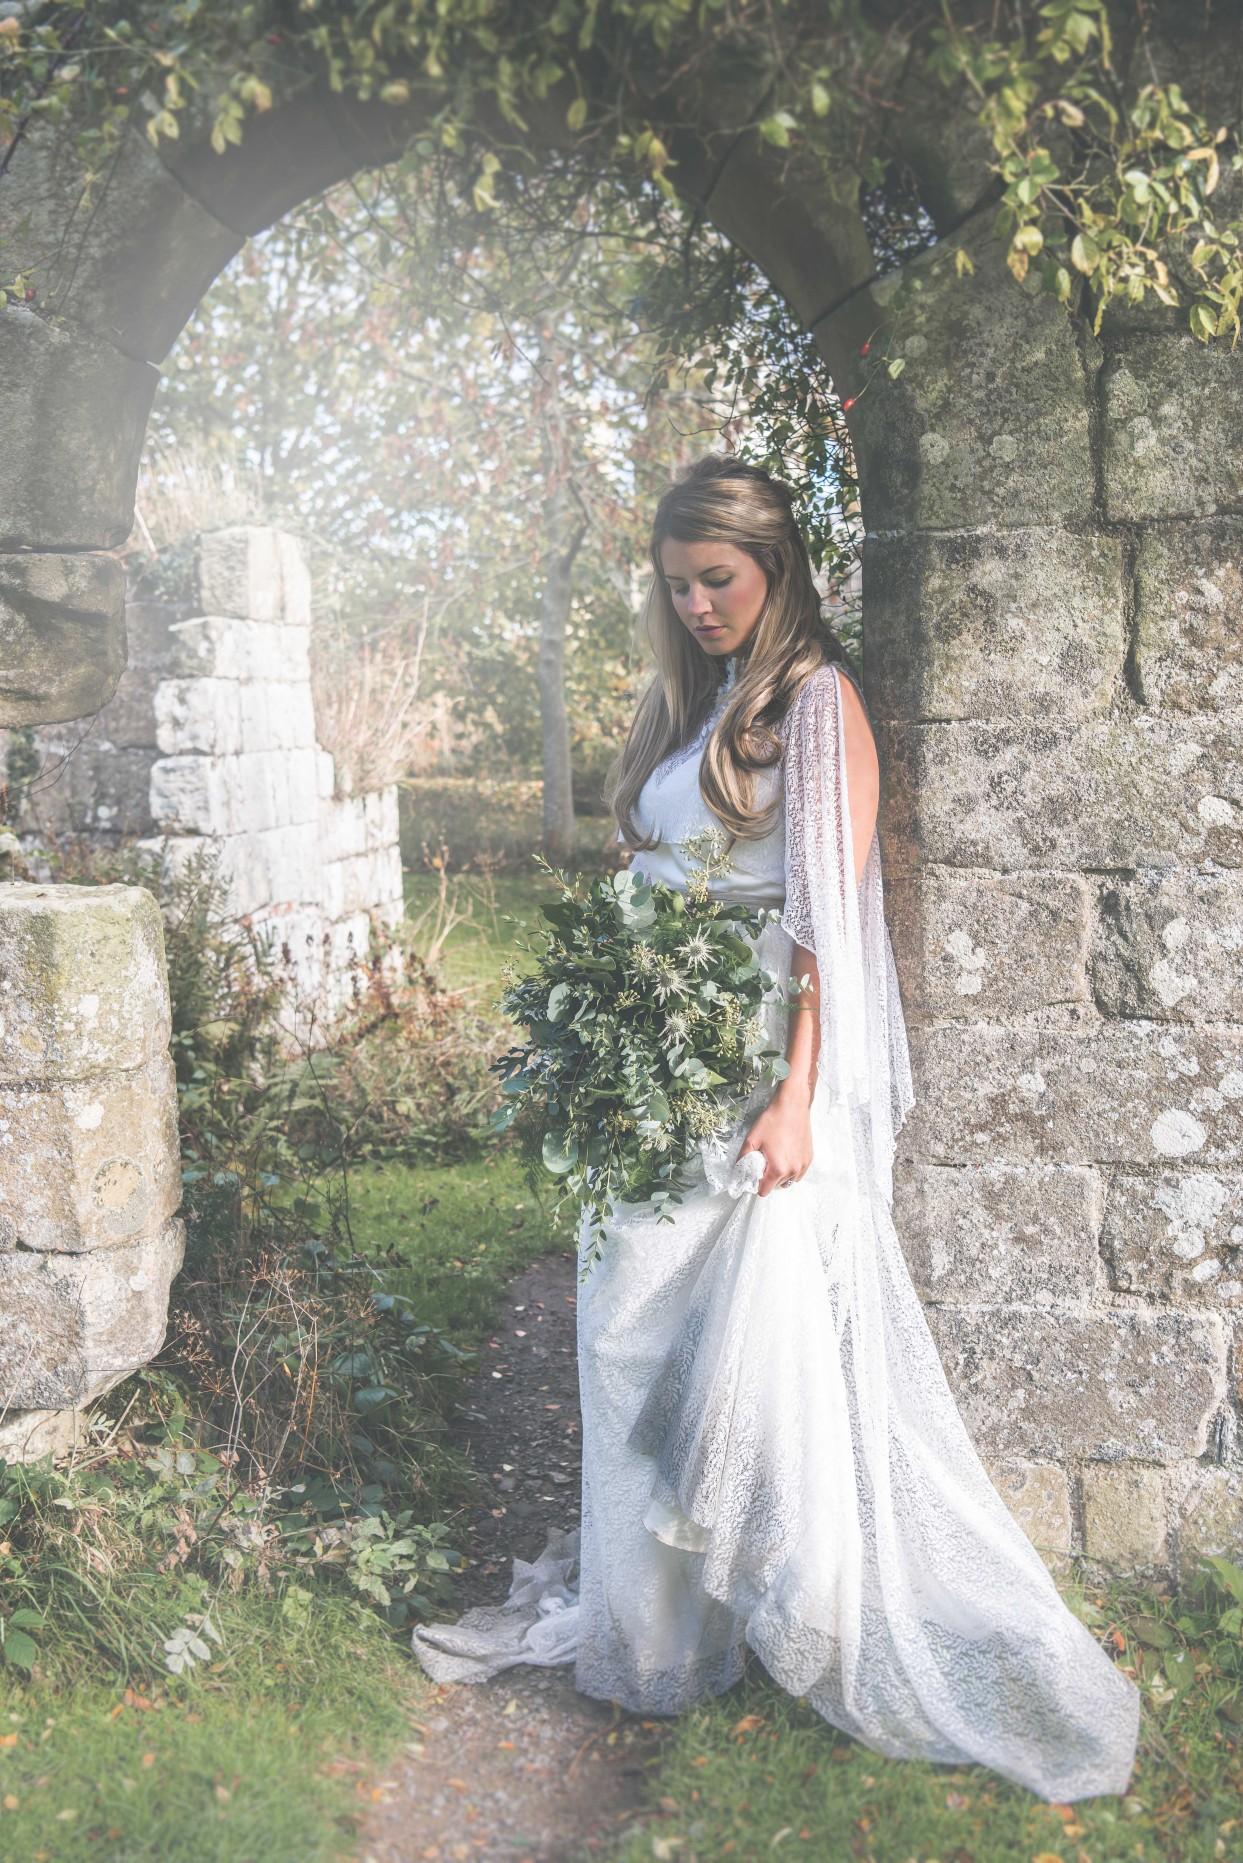 Live your own fairytale wedding - BexBrides - Jervaulx-36 (2)